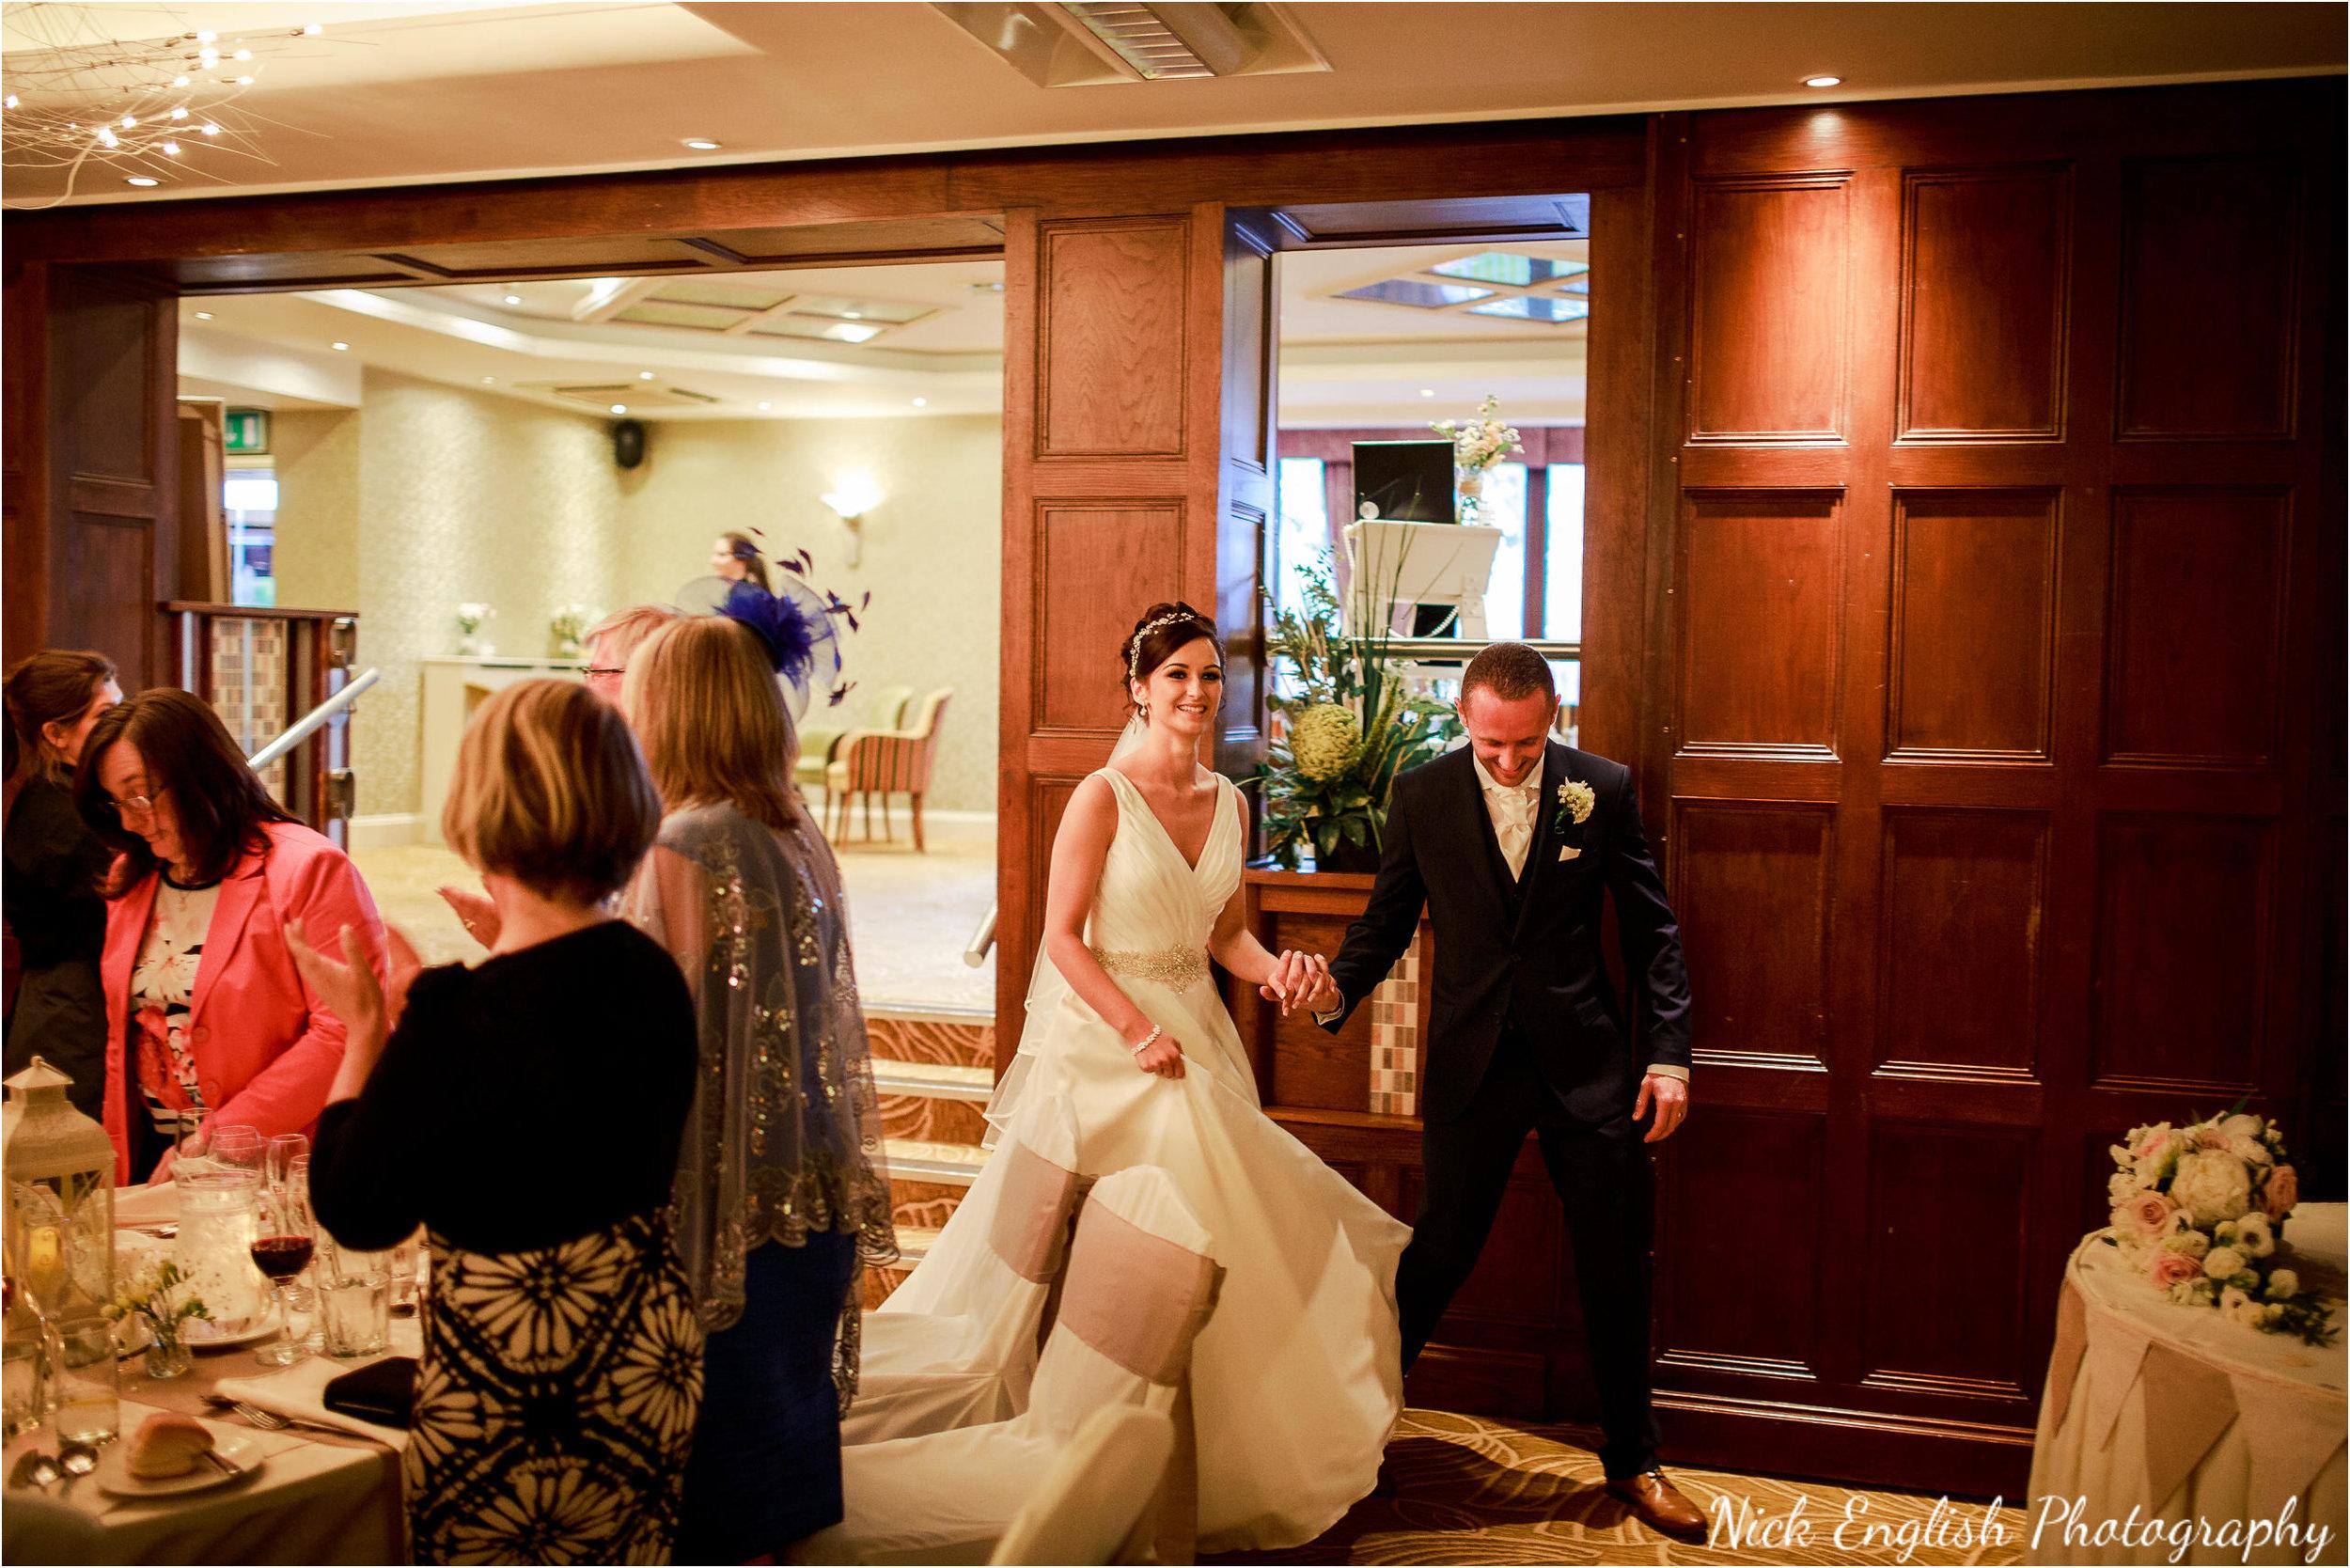 Emily David Wedding Photographs at Barton Grange Preston by Nick English Photography 165jpg.jpeg